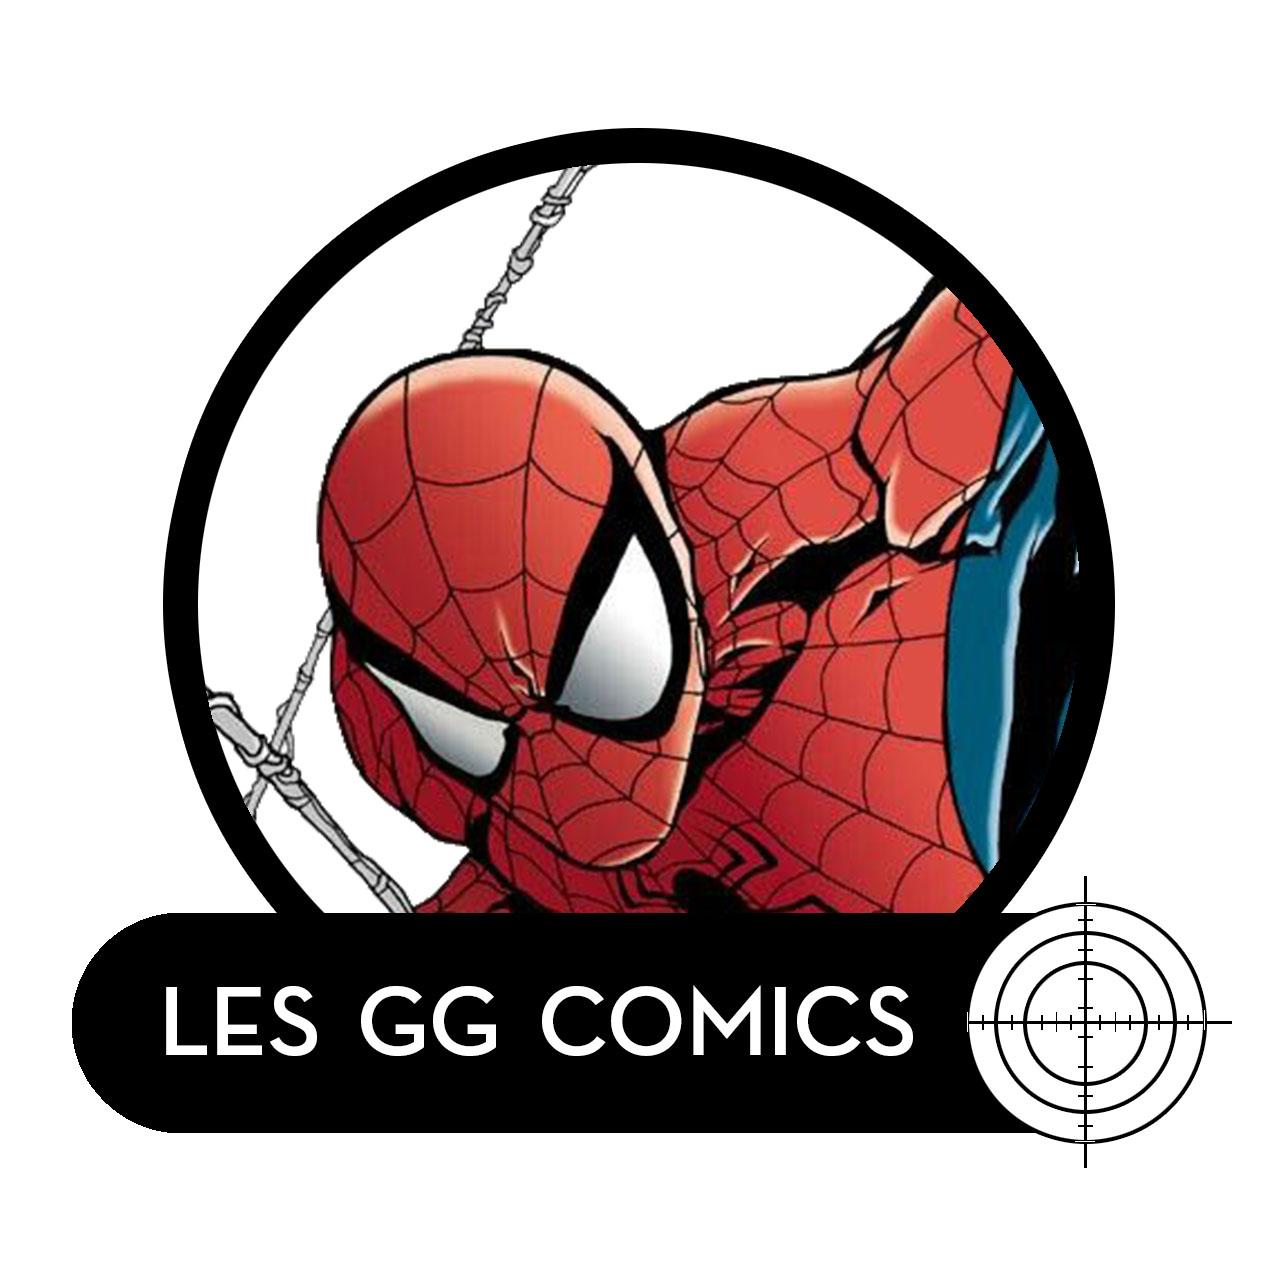 Les GG comics - HS5 : ITW de Giuseppe Camuncoli